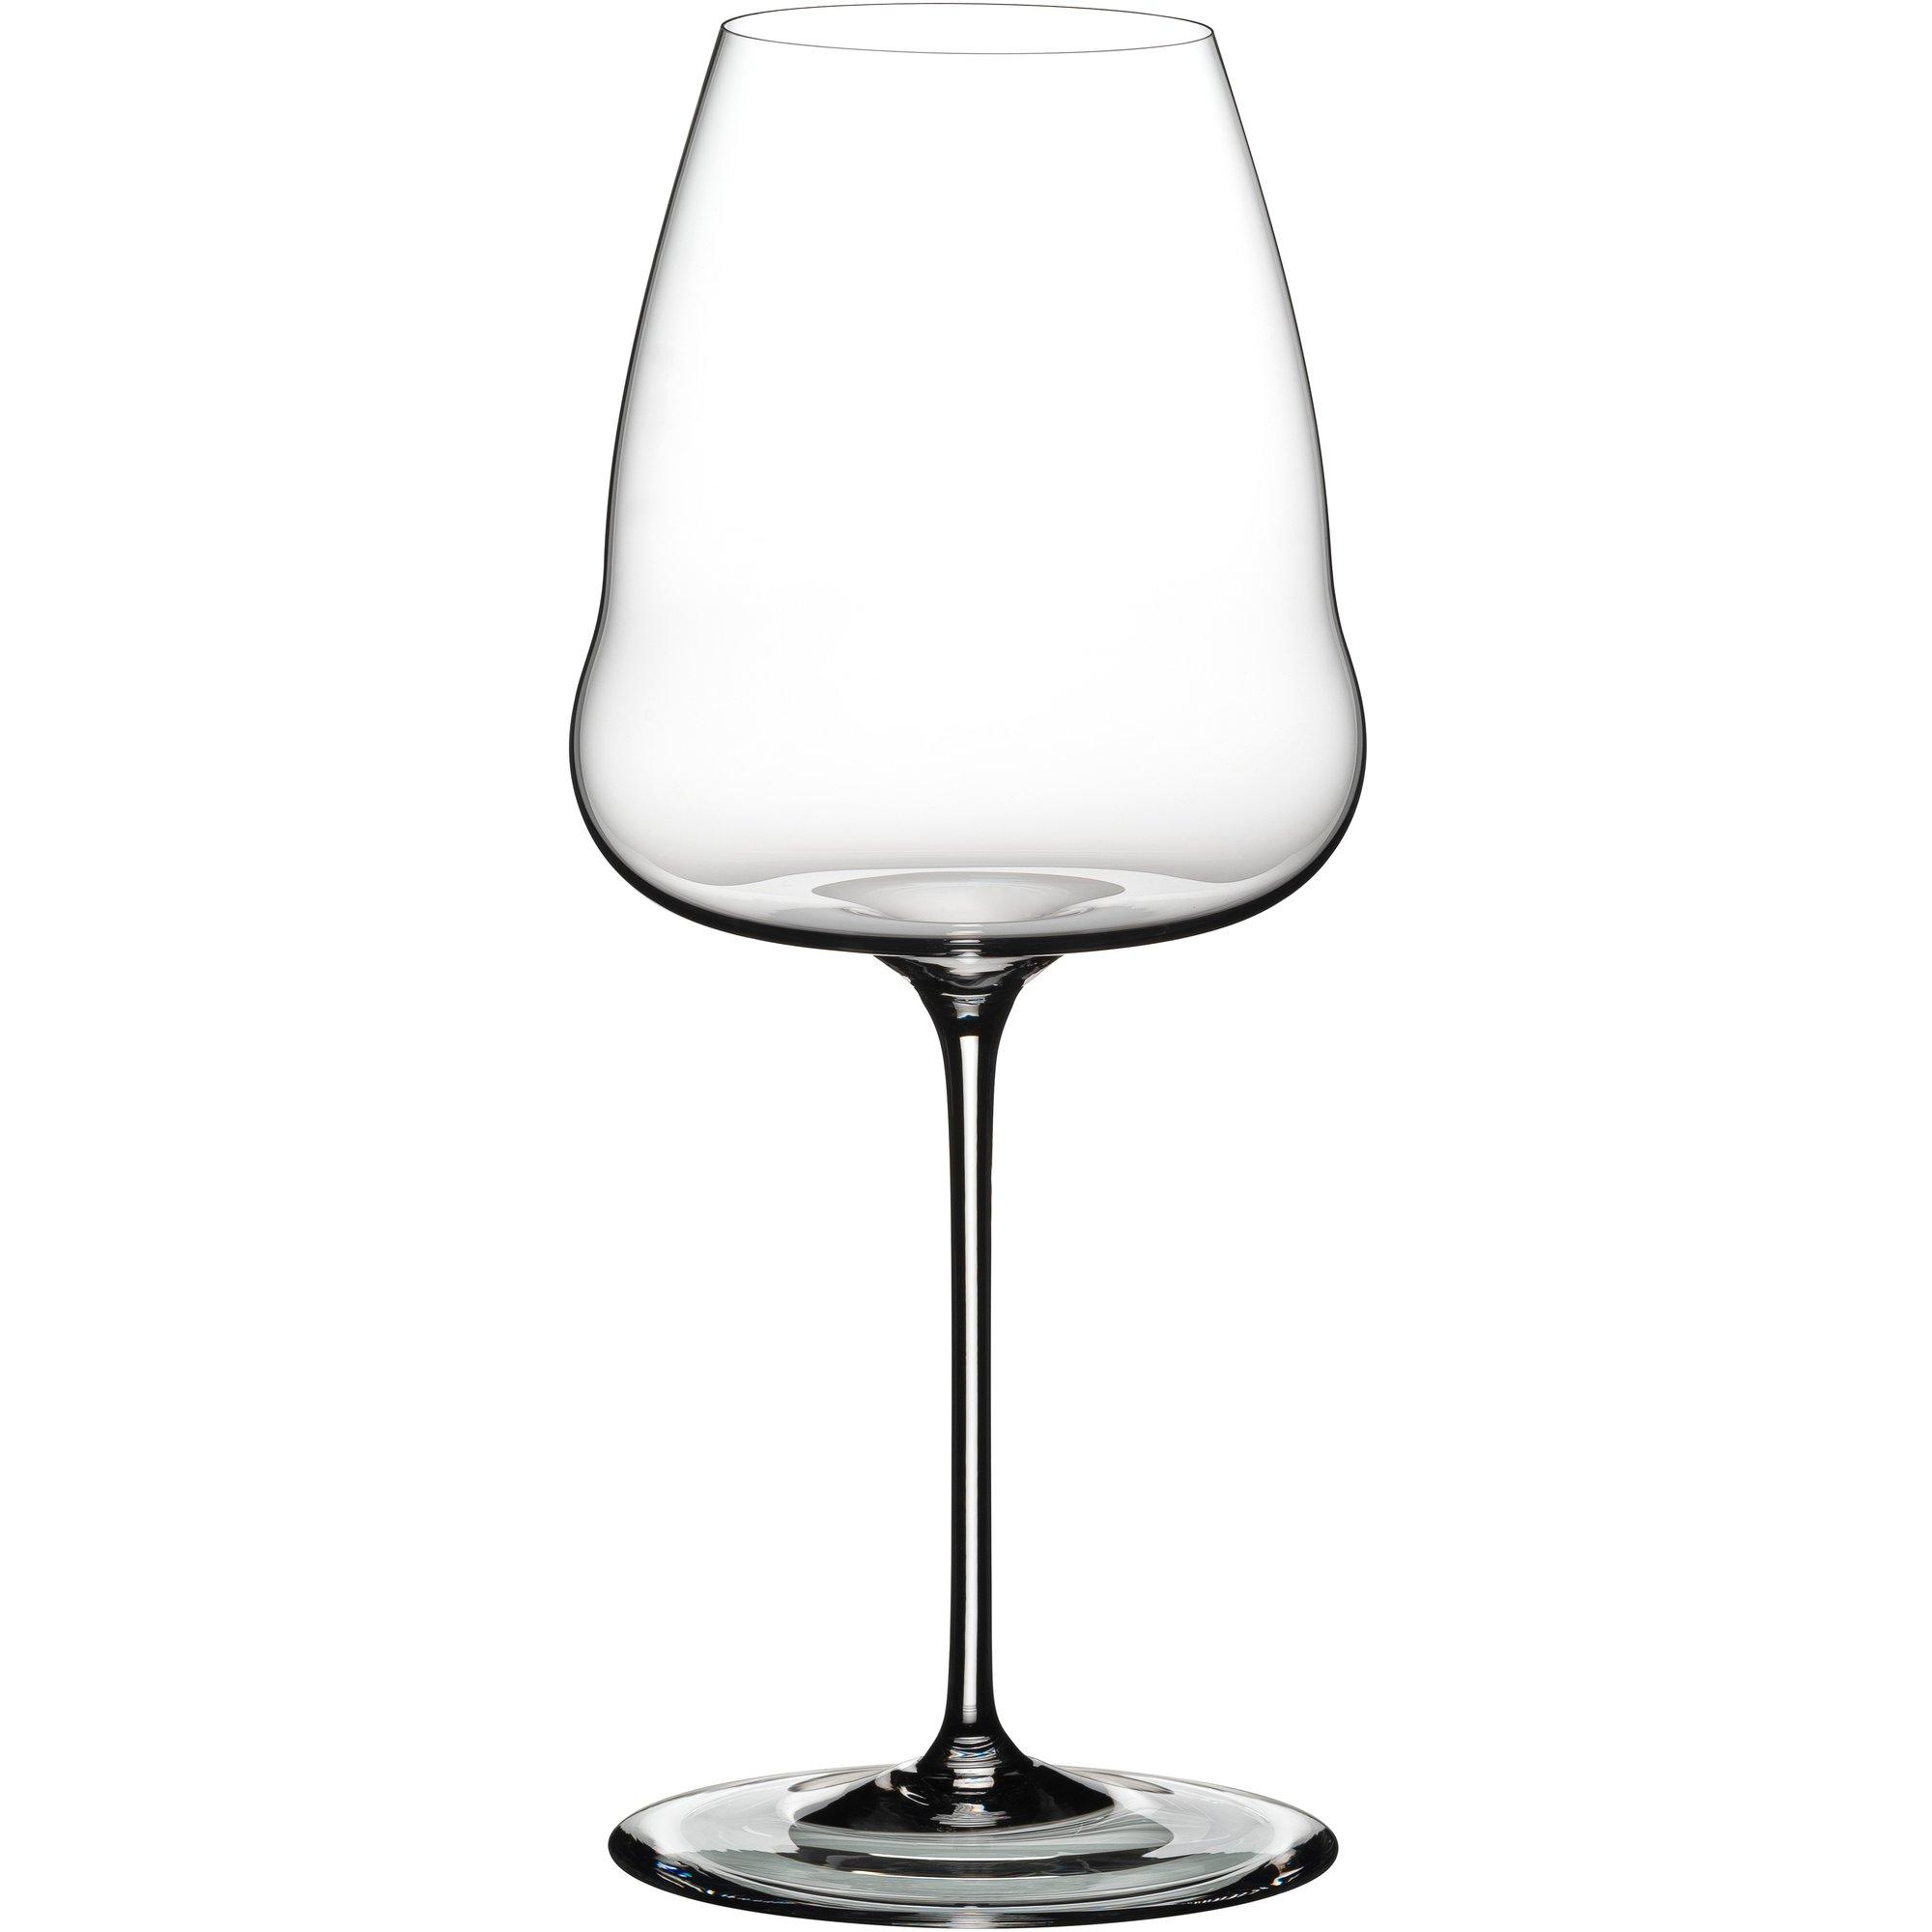 Riedel Winewings champagneglas